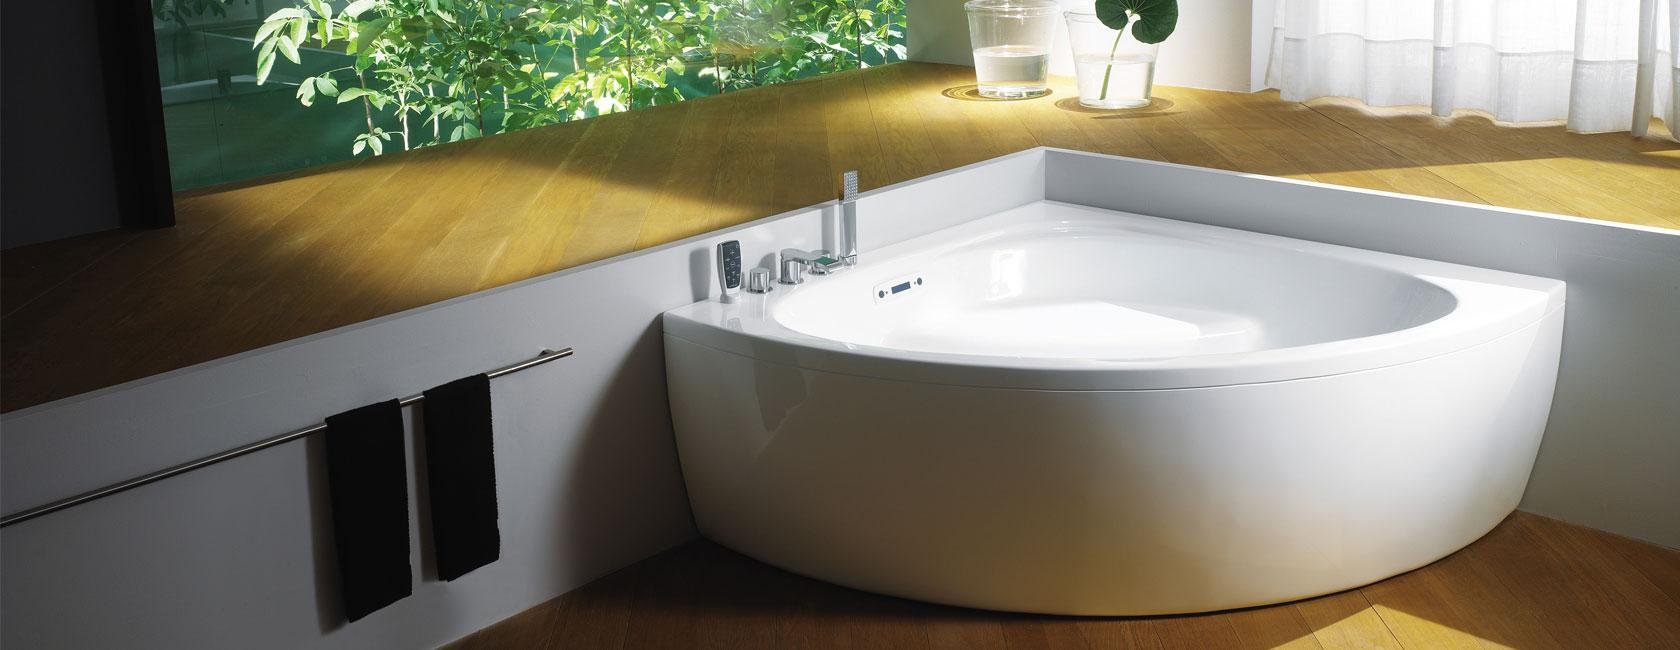 TEUCO Vasche da Bagno - Vasche da Bagno - Edilceramiche di ...